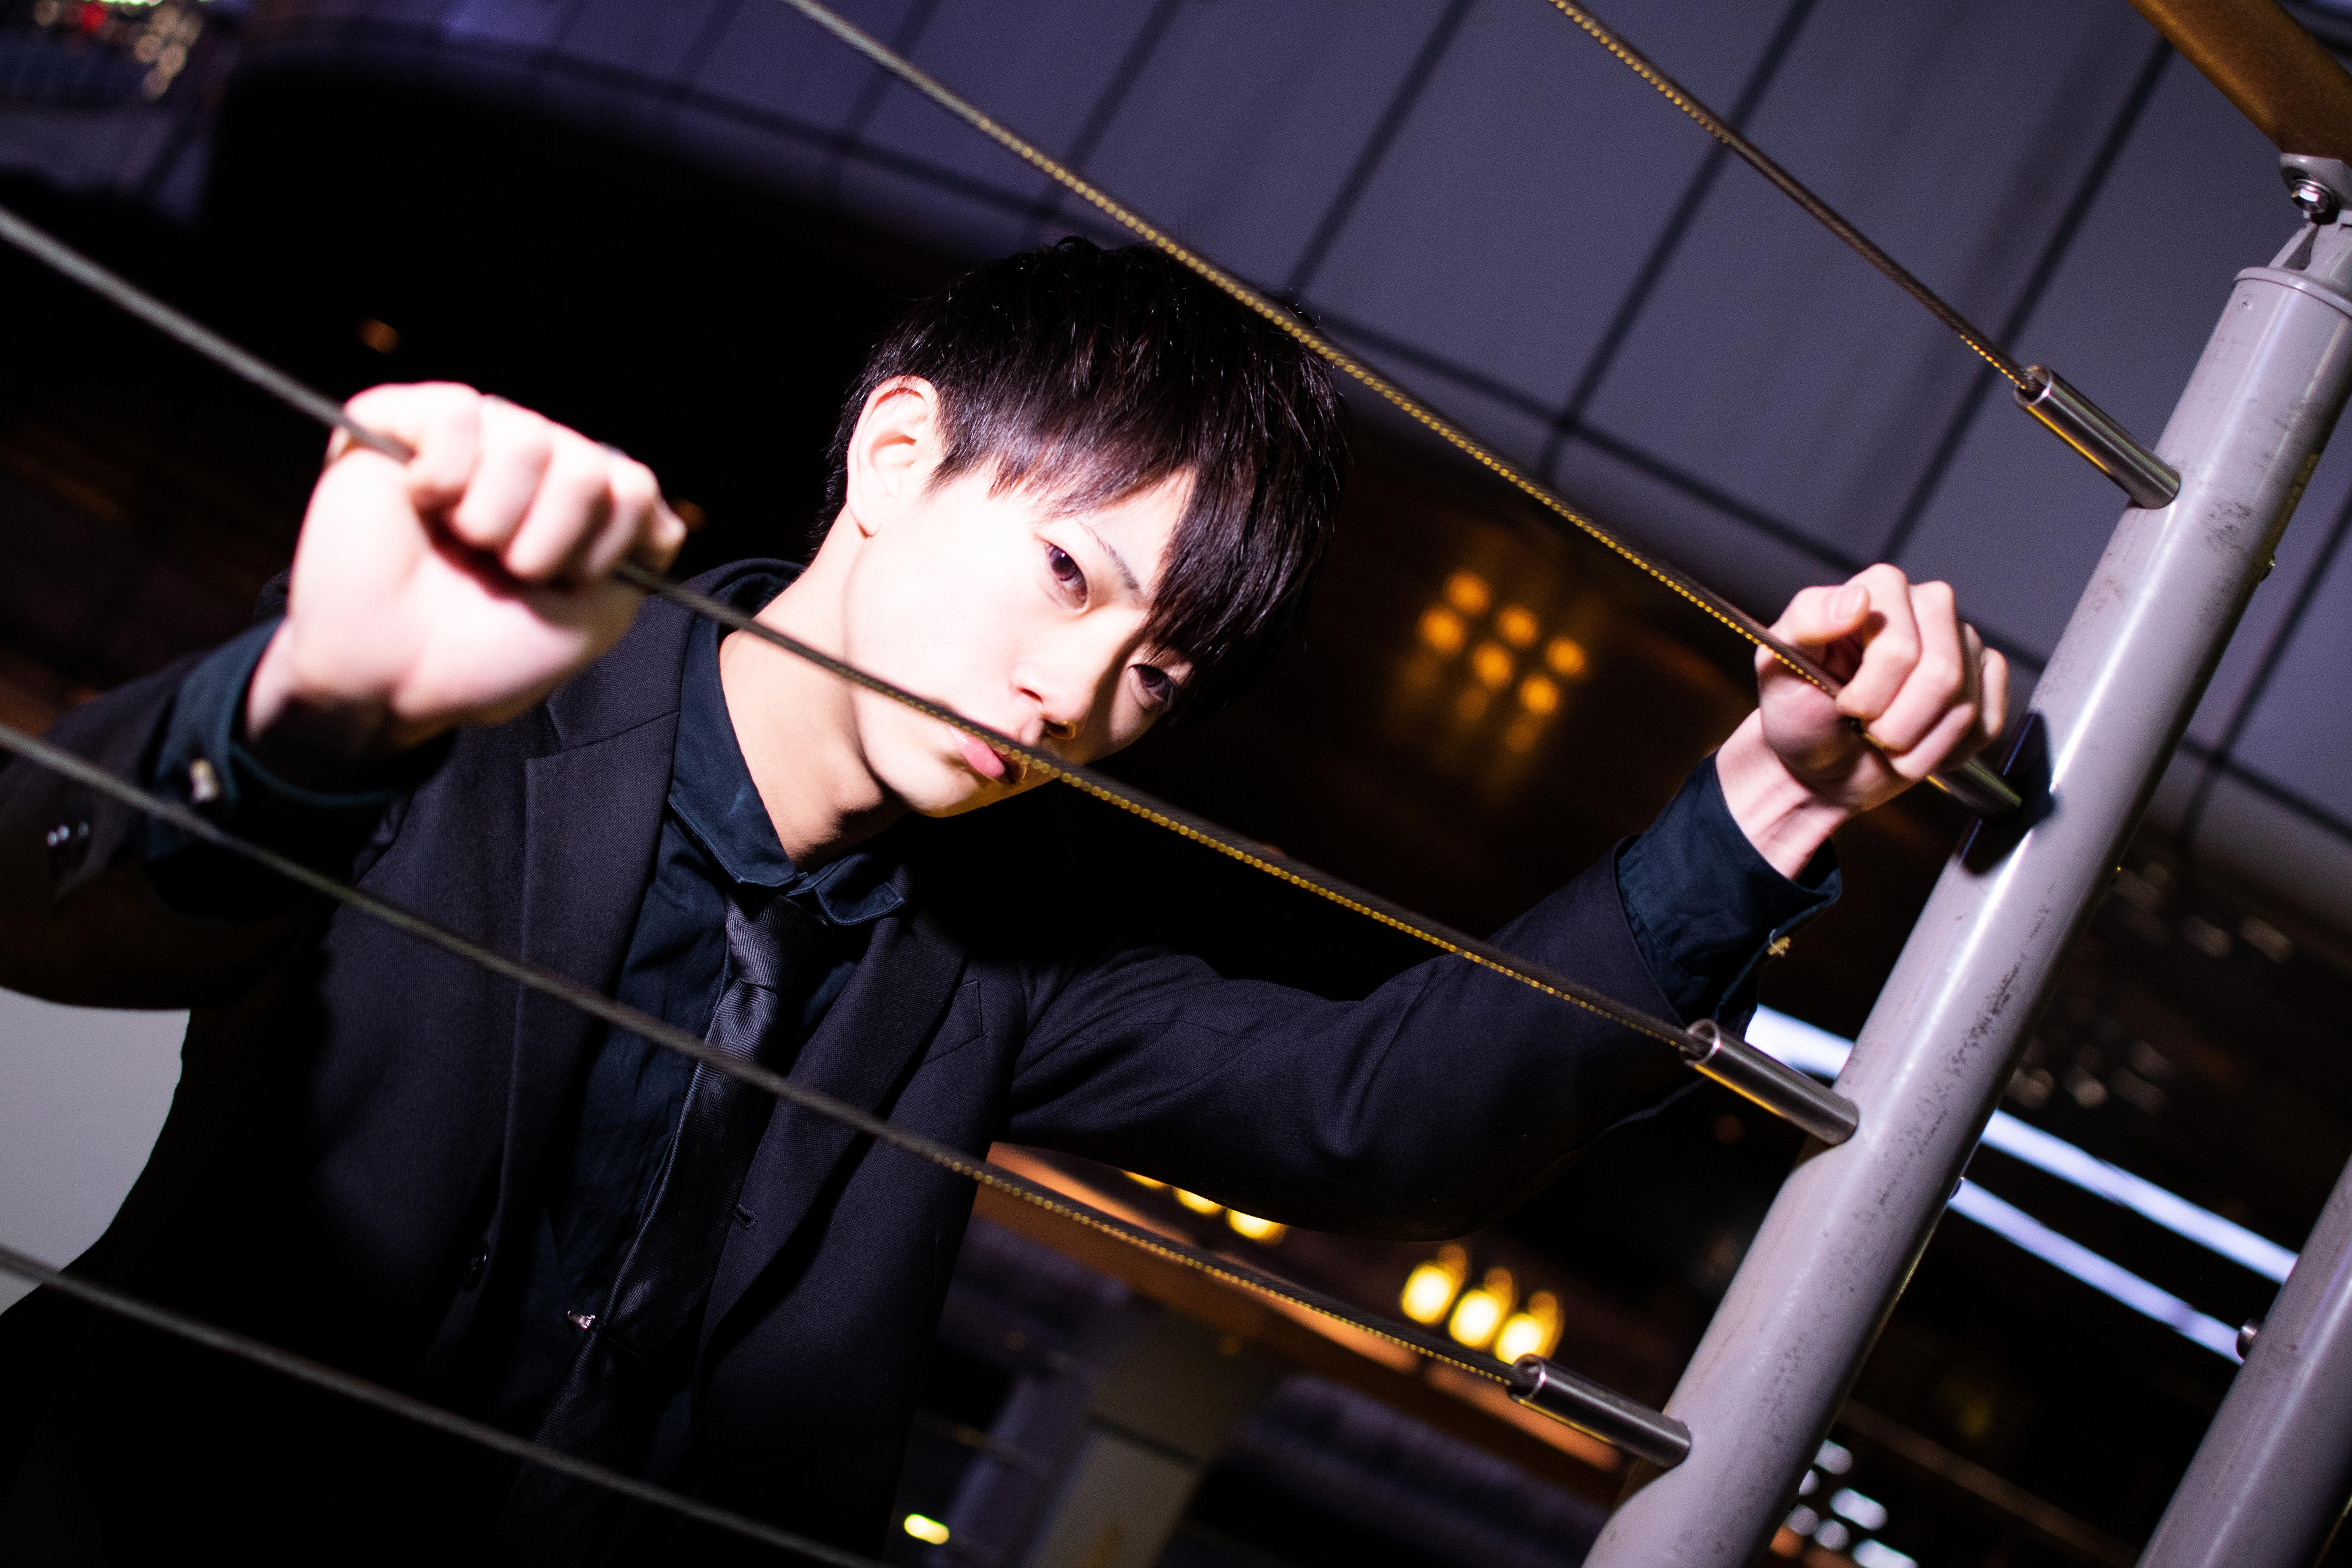 Ryoma Ayaseのグラビア画像(10)